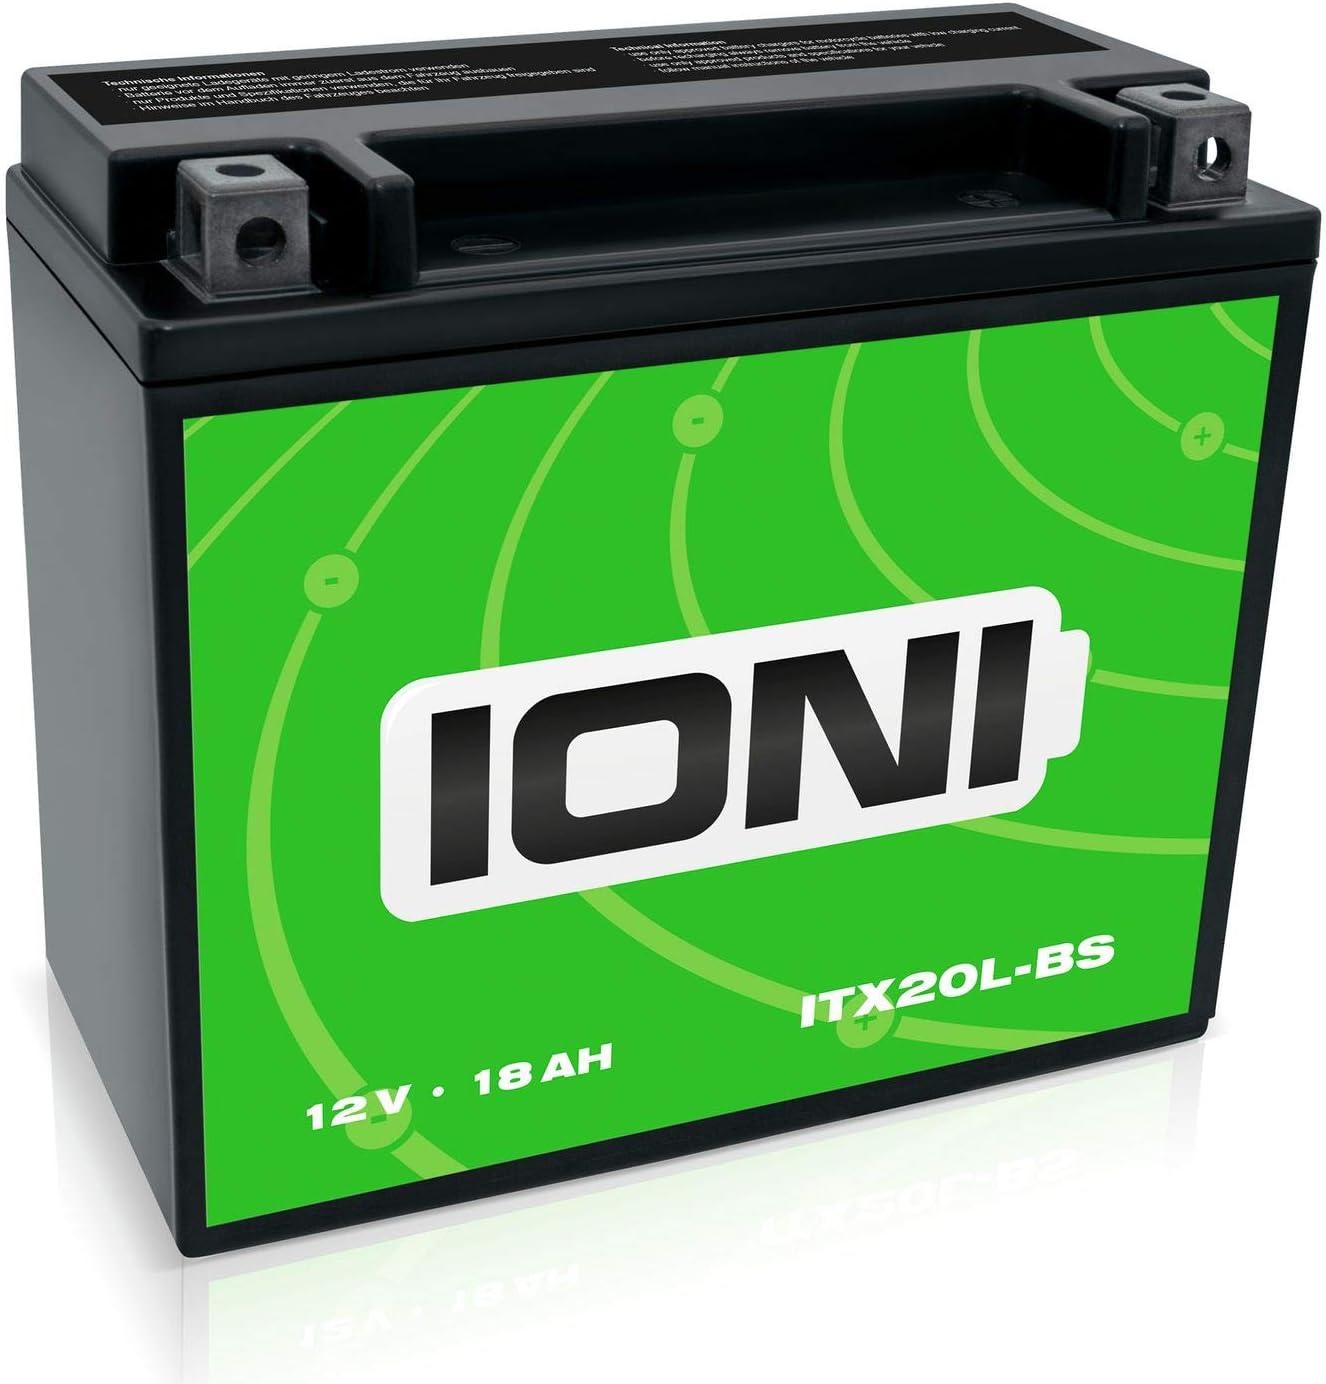 Ioni Itz7s 12v 6ah Agm Batterie Kompatibel Mit Ytz7s Ytz6s Mg7zs Versiegelt Wartungsfrei Motorradbatterie Auto